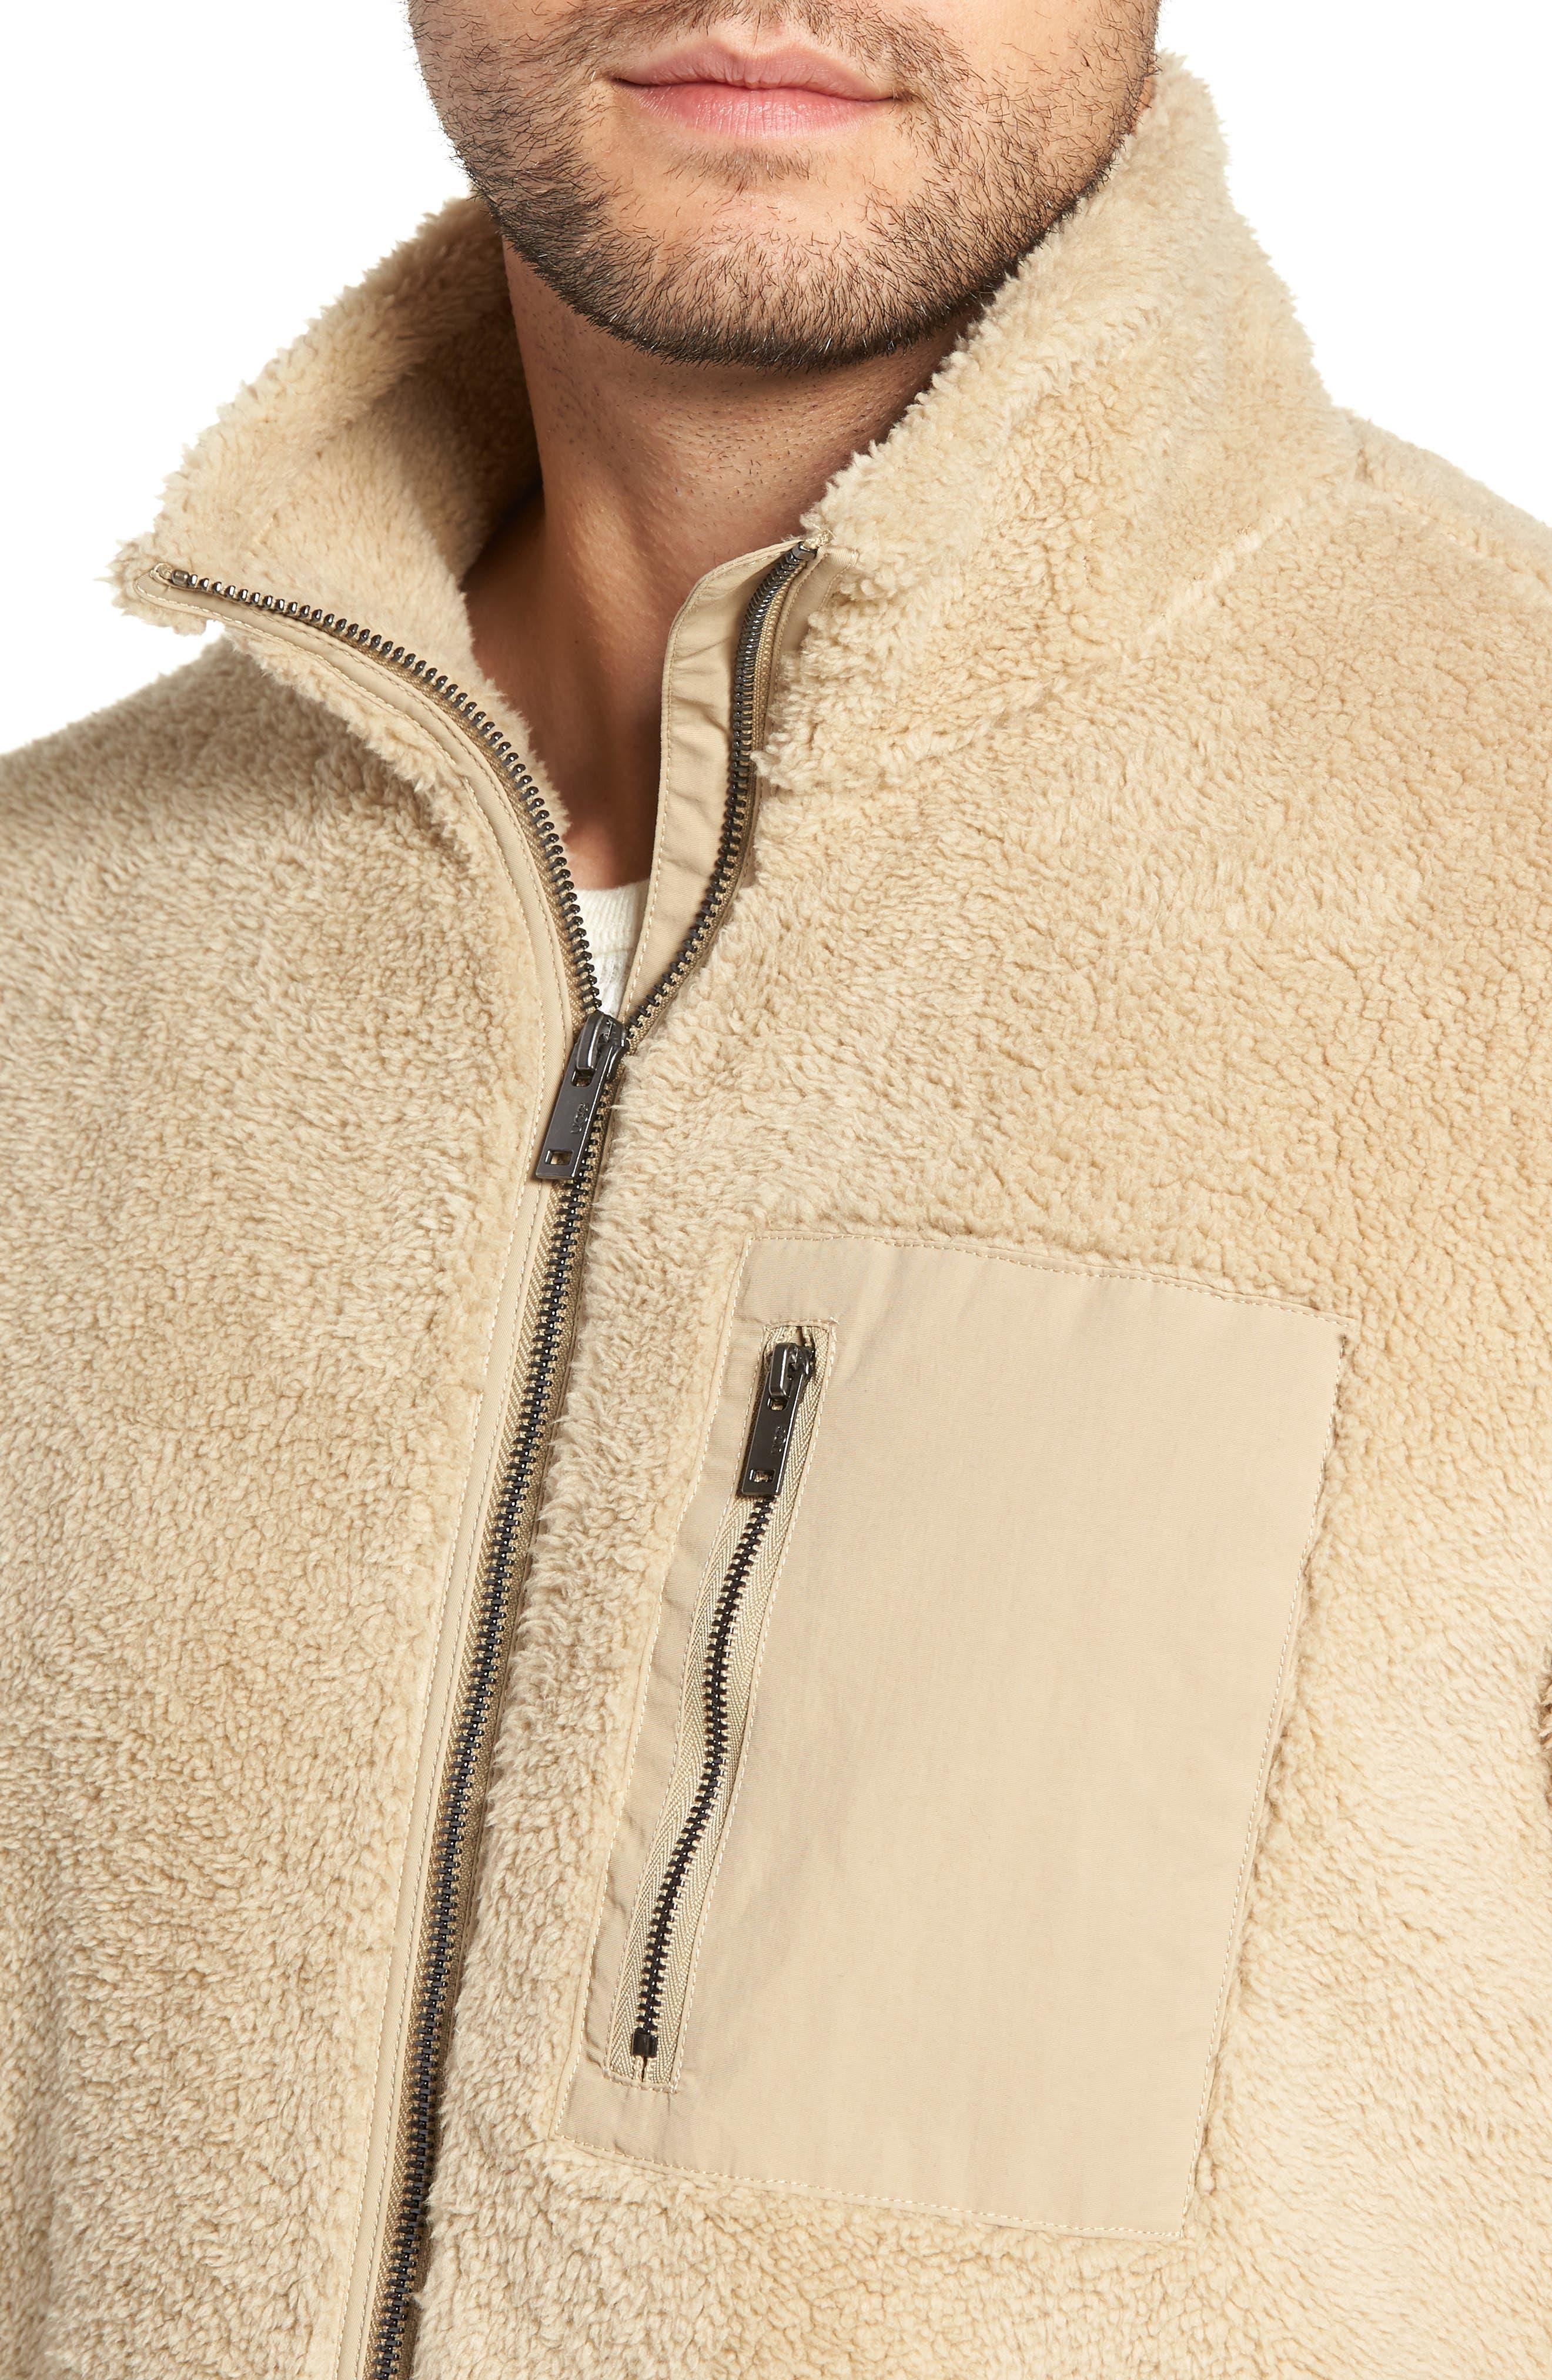 Lucas High Pile Fleece Sweater Jacket,                             Alternate thumbnail 4, color,                             SAND